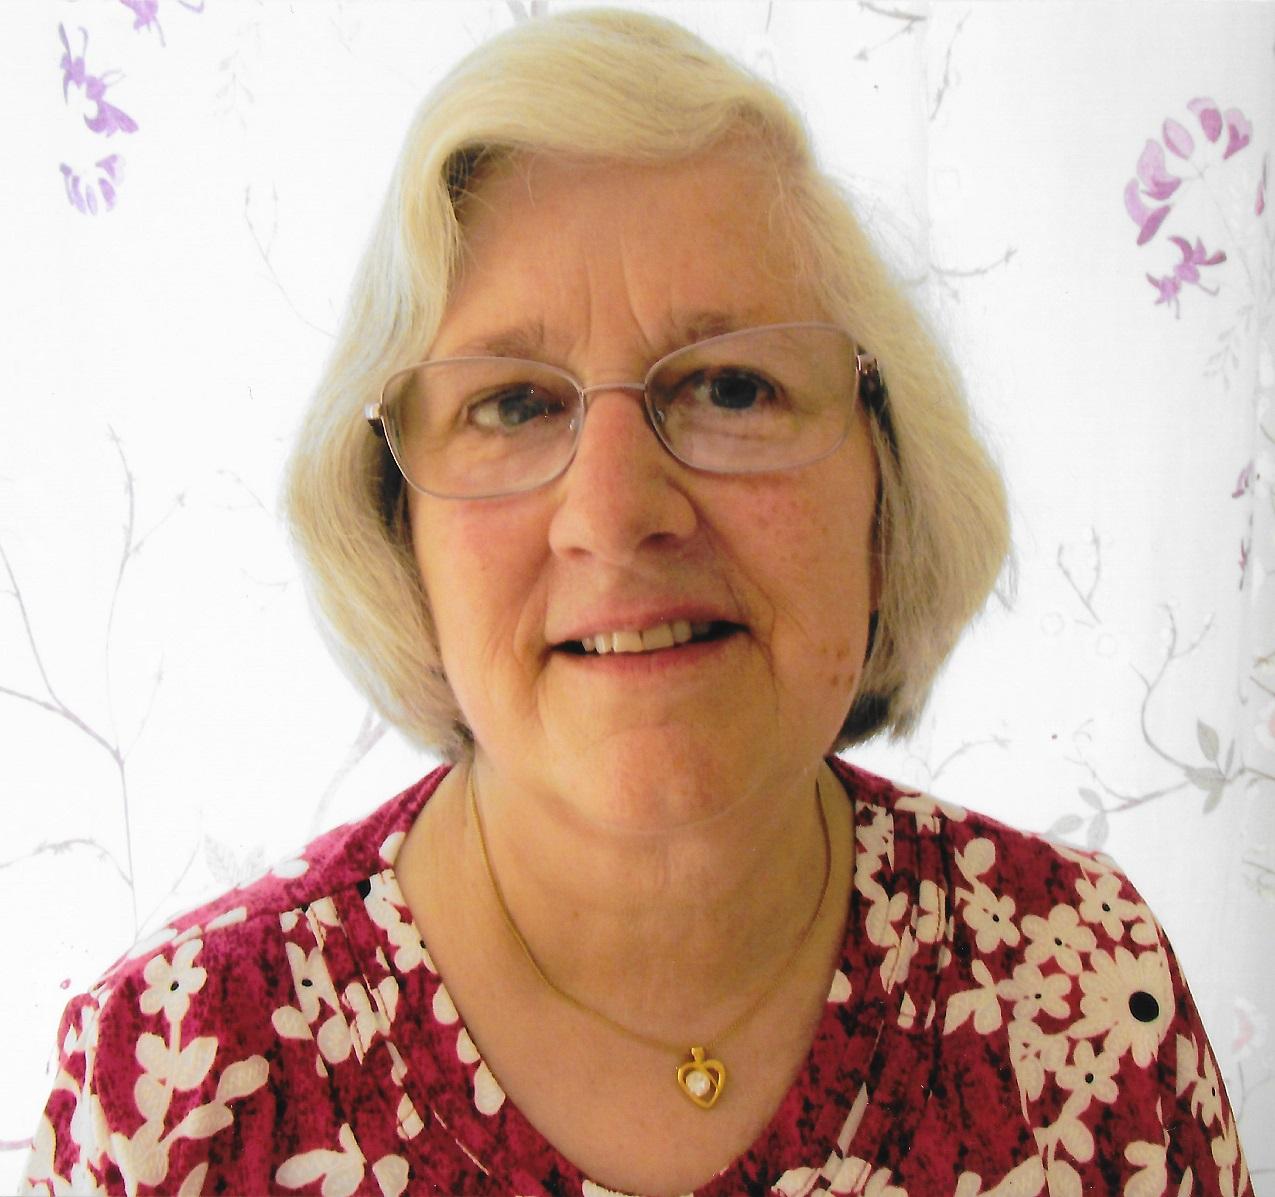 Angie McEvansoneya